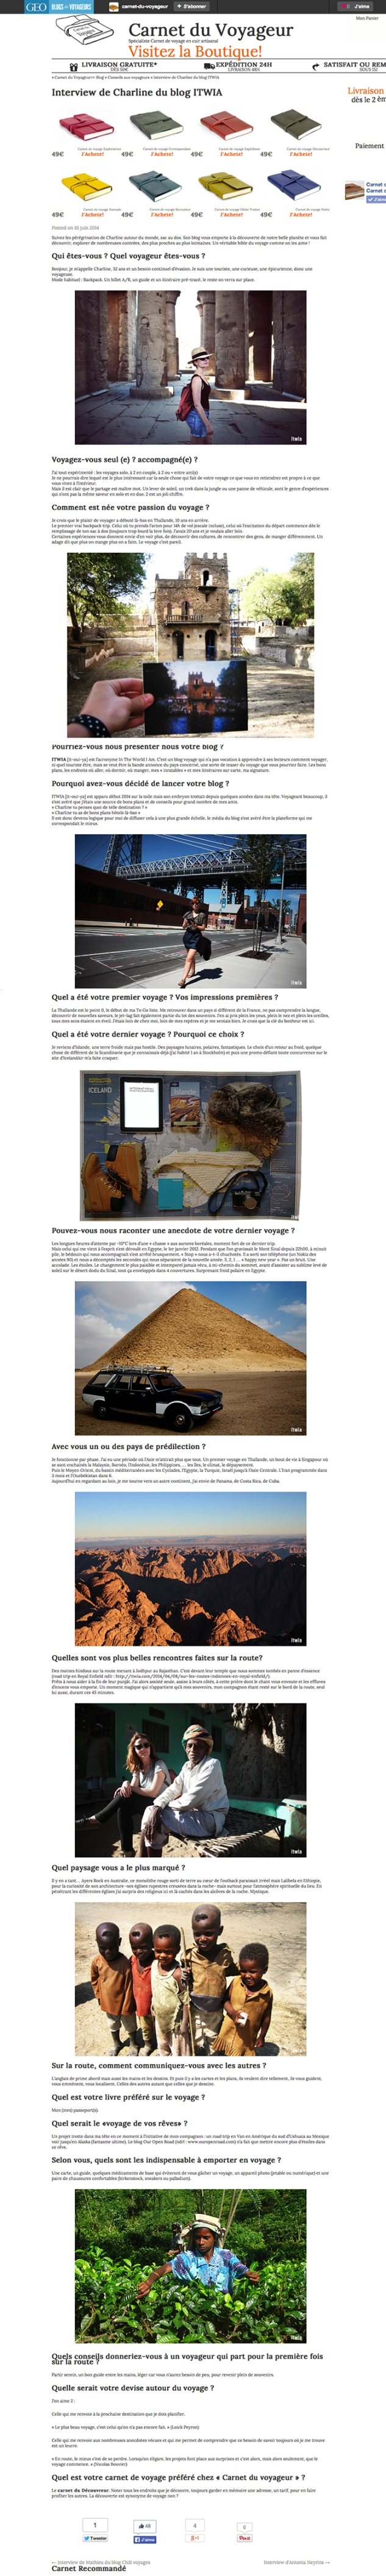 Itwia_Presse_CarnetduVoyageur_Itw_700px